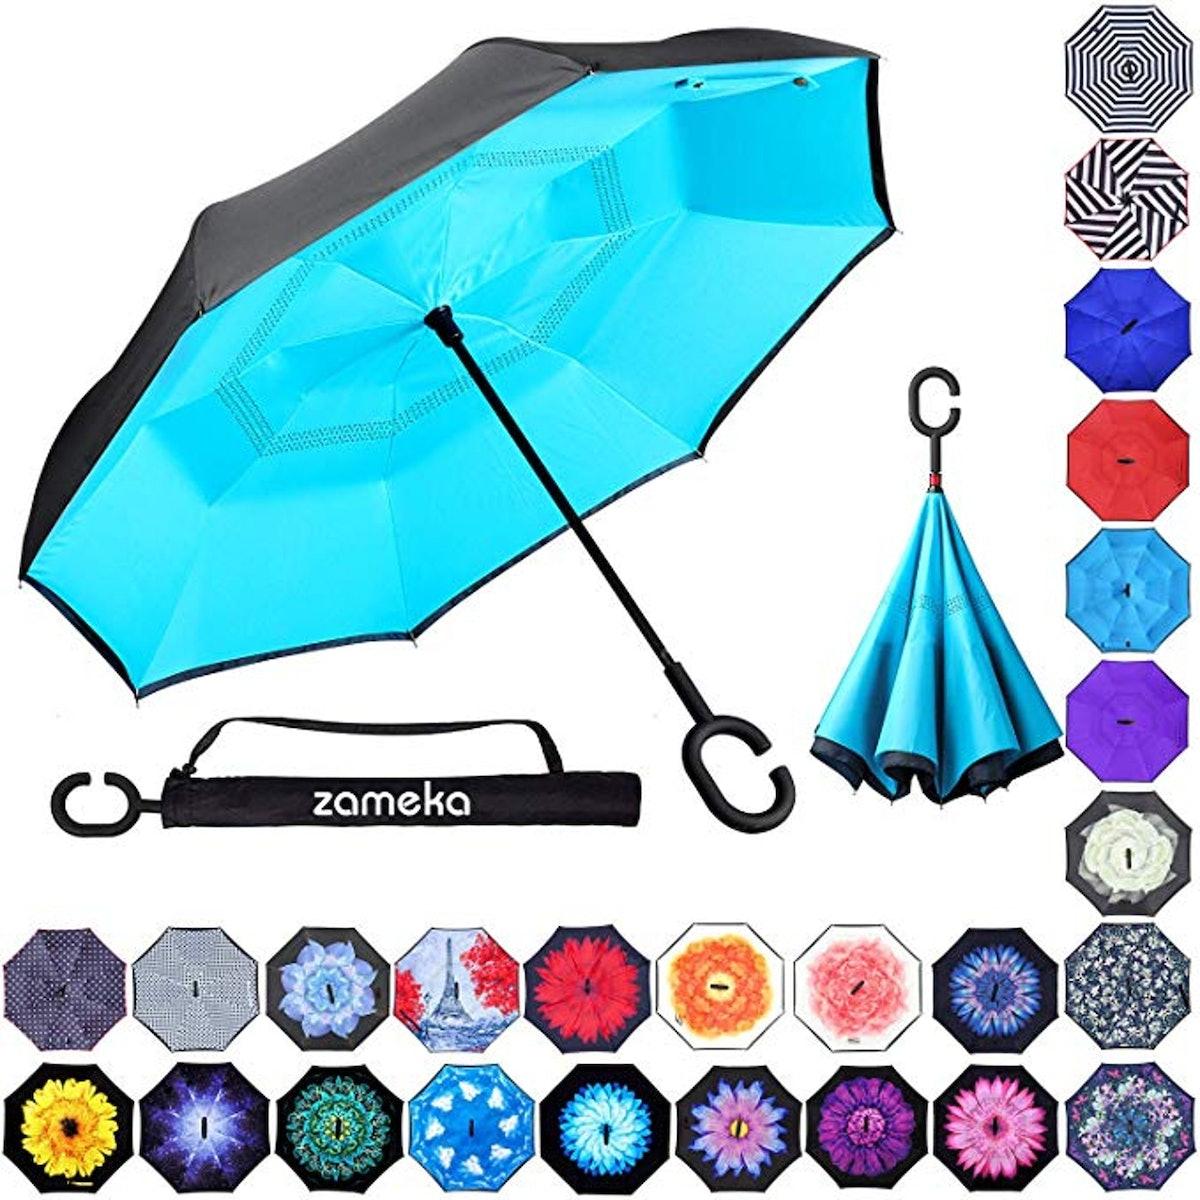 ZAMEKA Double Layer Inverted Umbrella